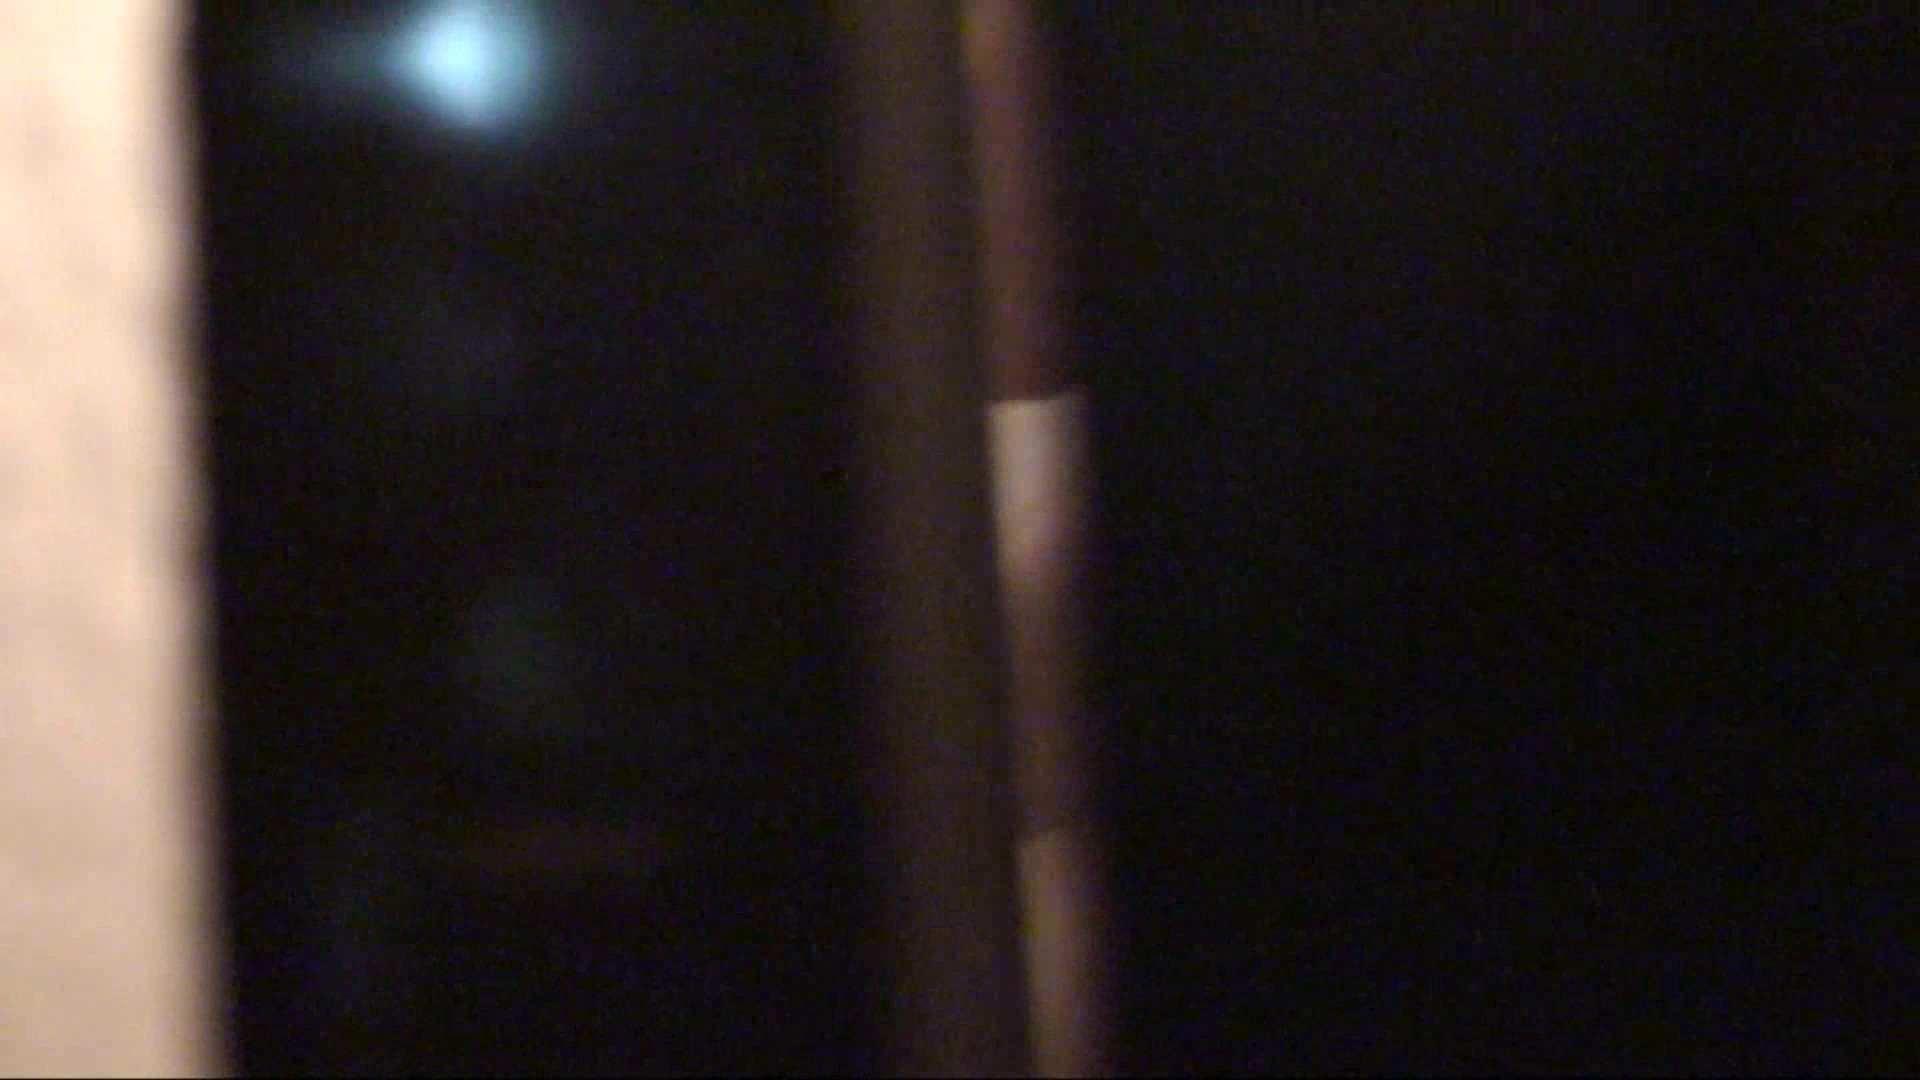 vol.01必見!白肌嬢の乳首が丸見え。極上美人のすっぴん顔をハイビジョンで! 美乳 | 美人編  71画像 28